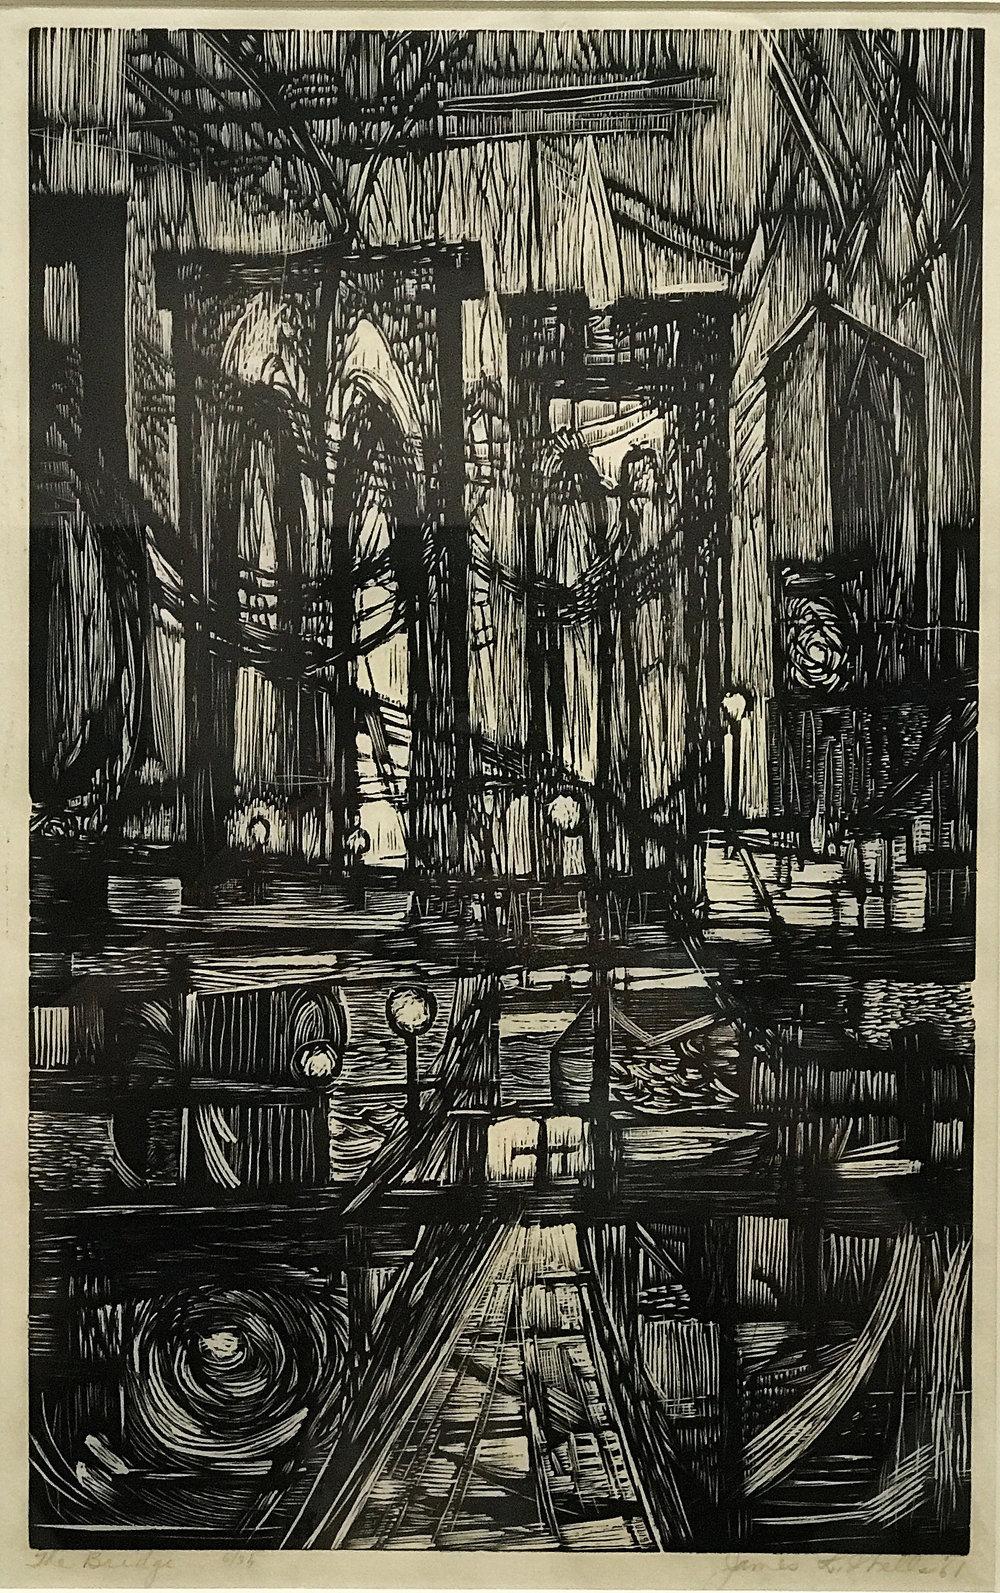 James Lesesene Wells. (1902-1993)   The Bridge , Woodcut, 25 1/8 x 19 1/8 inches,1961